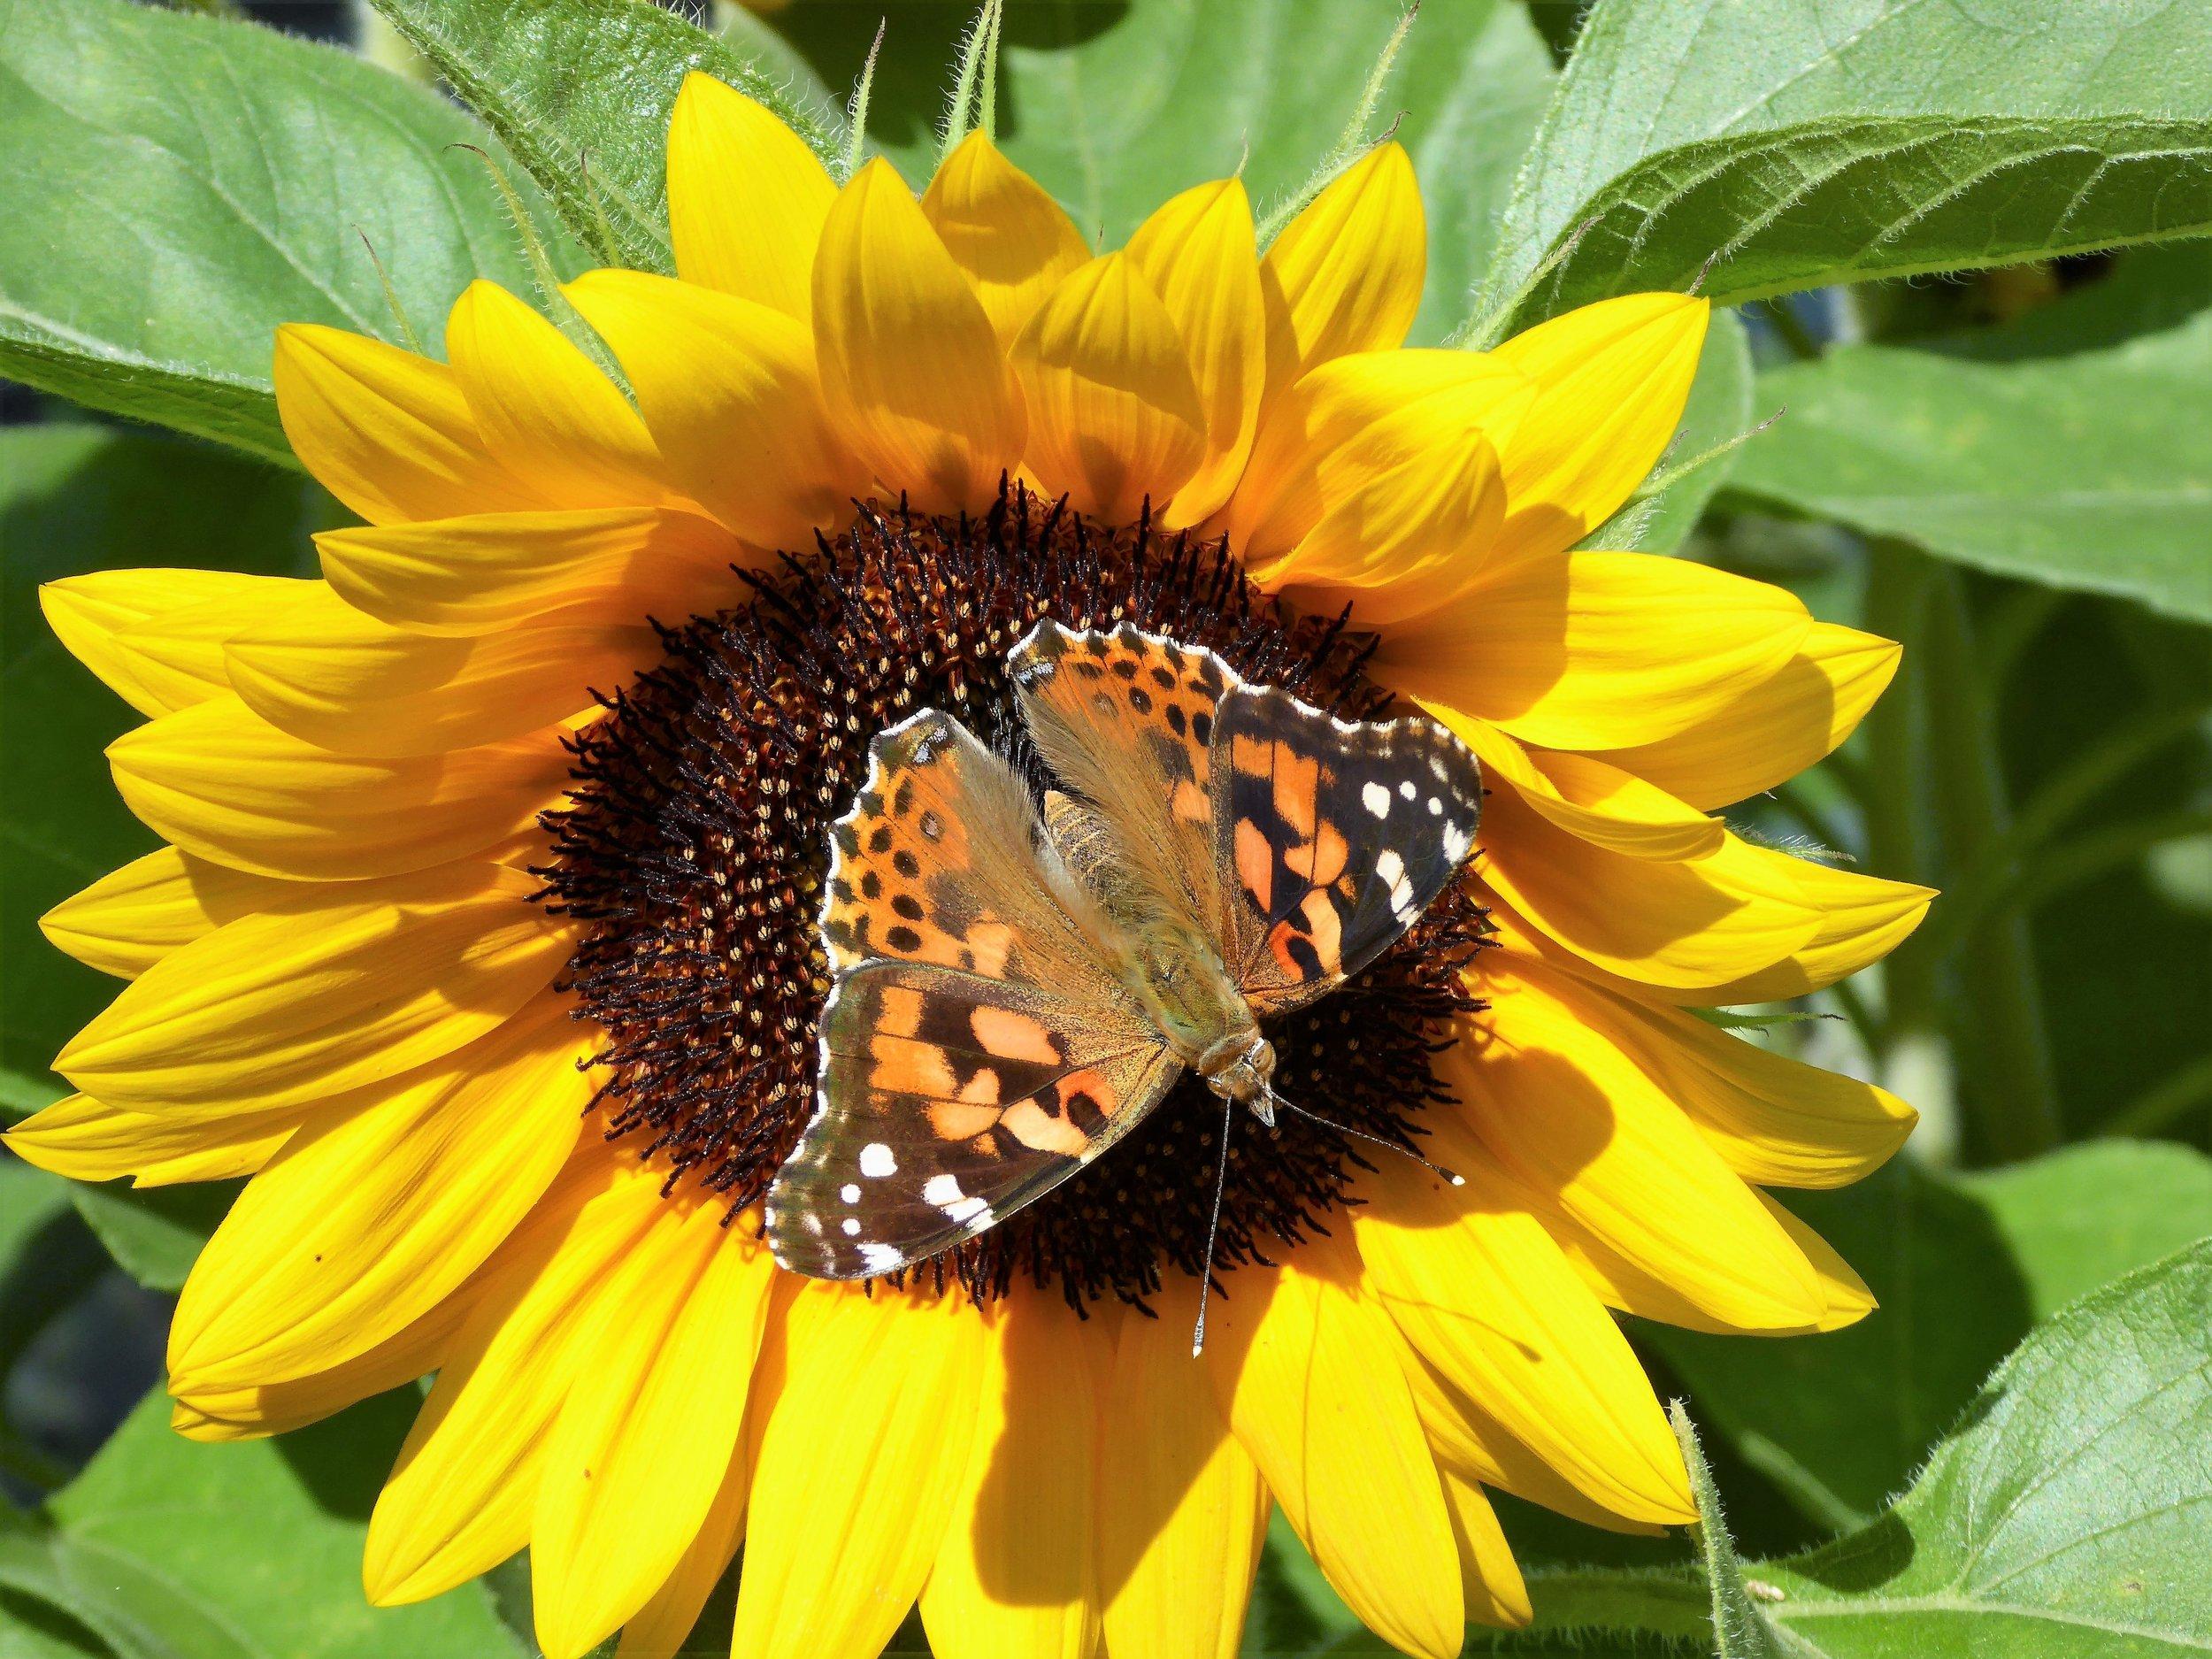 Sunflowers always attract pollinators